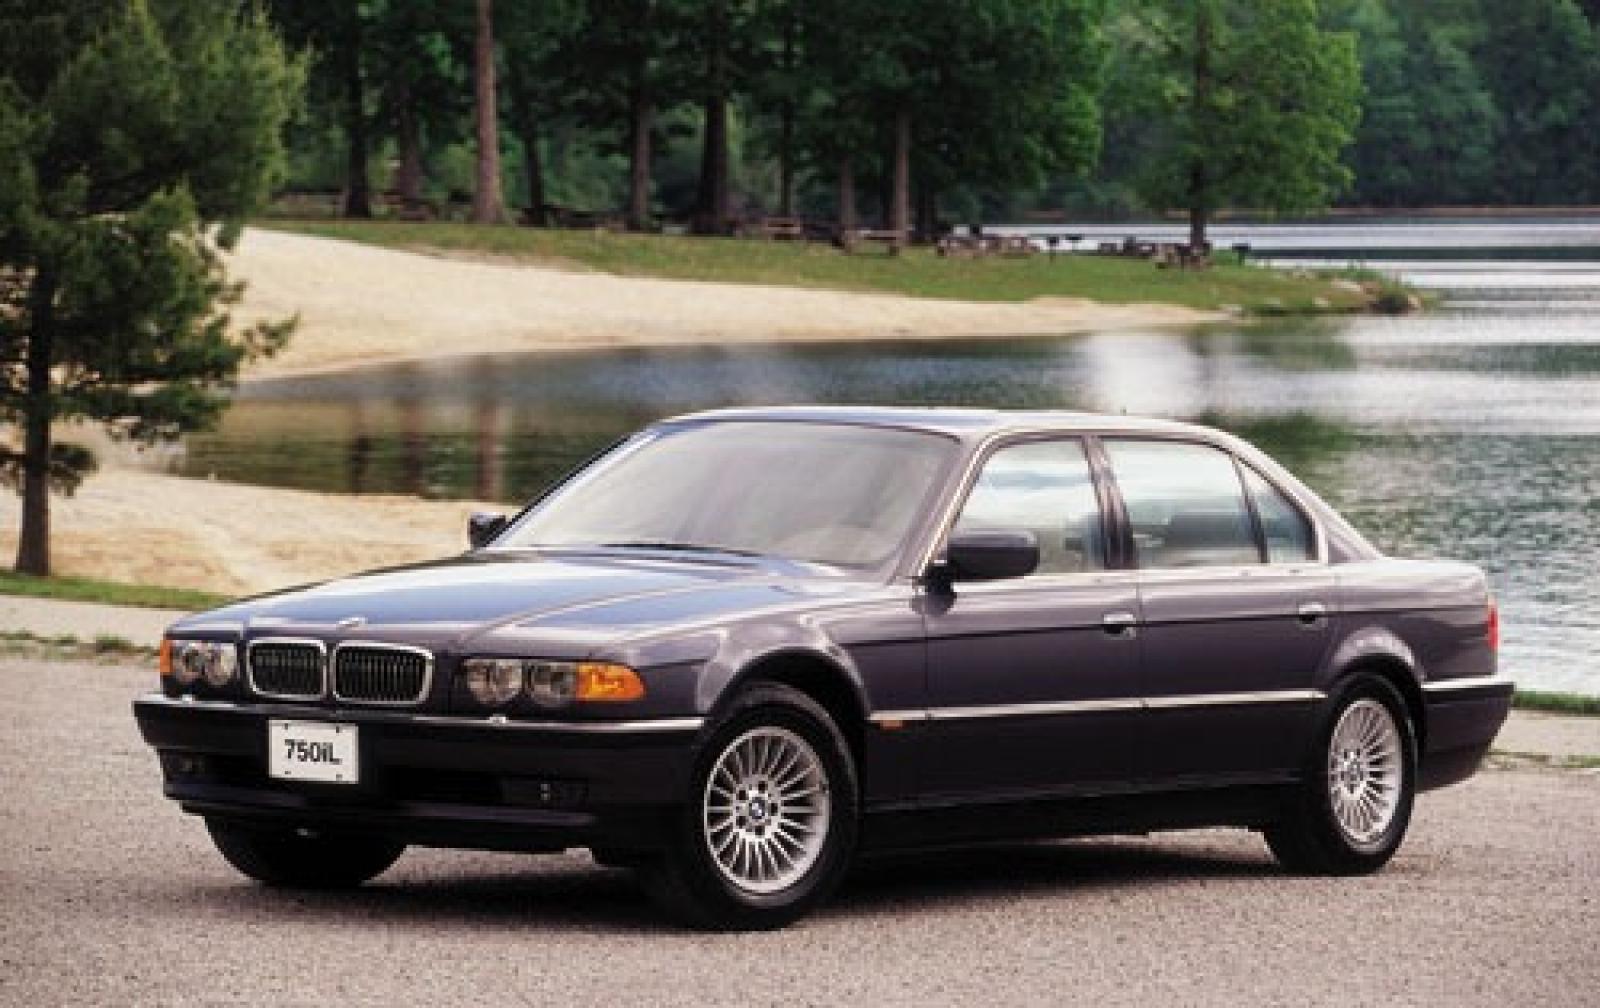 800 1024 1280 1600 Origin 2001 BMW